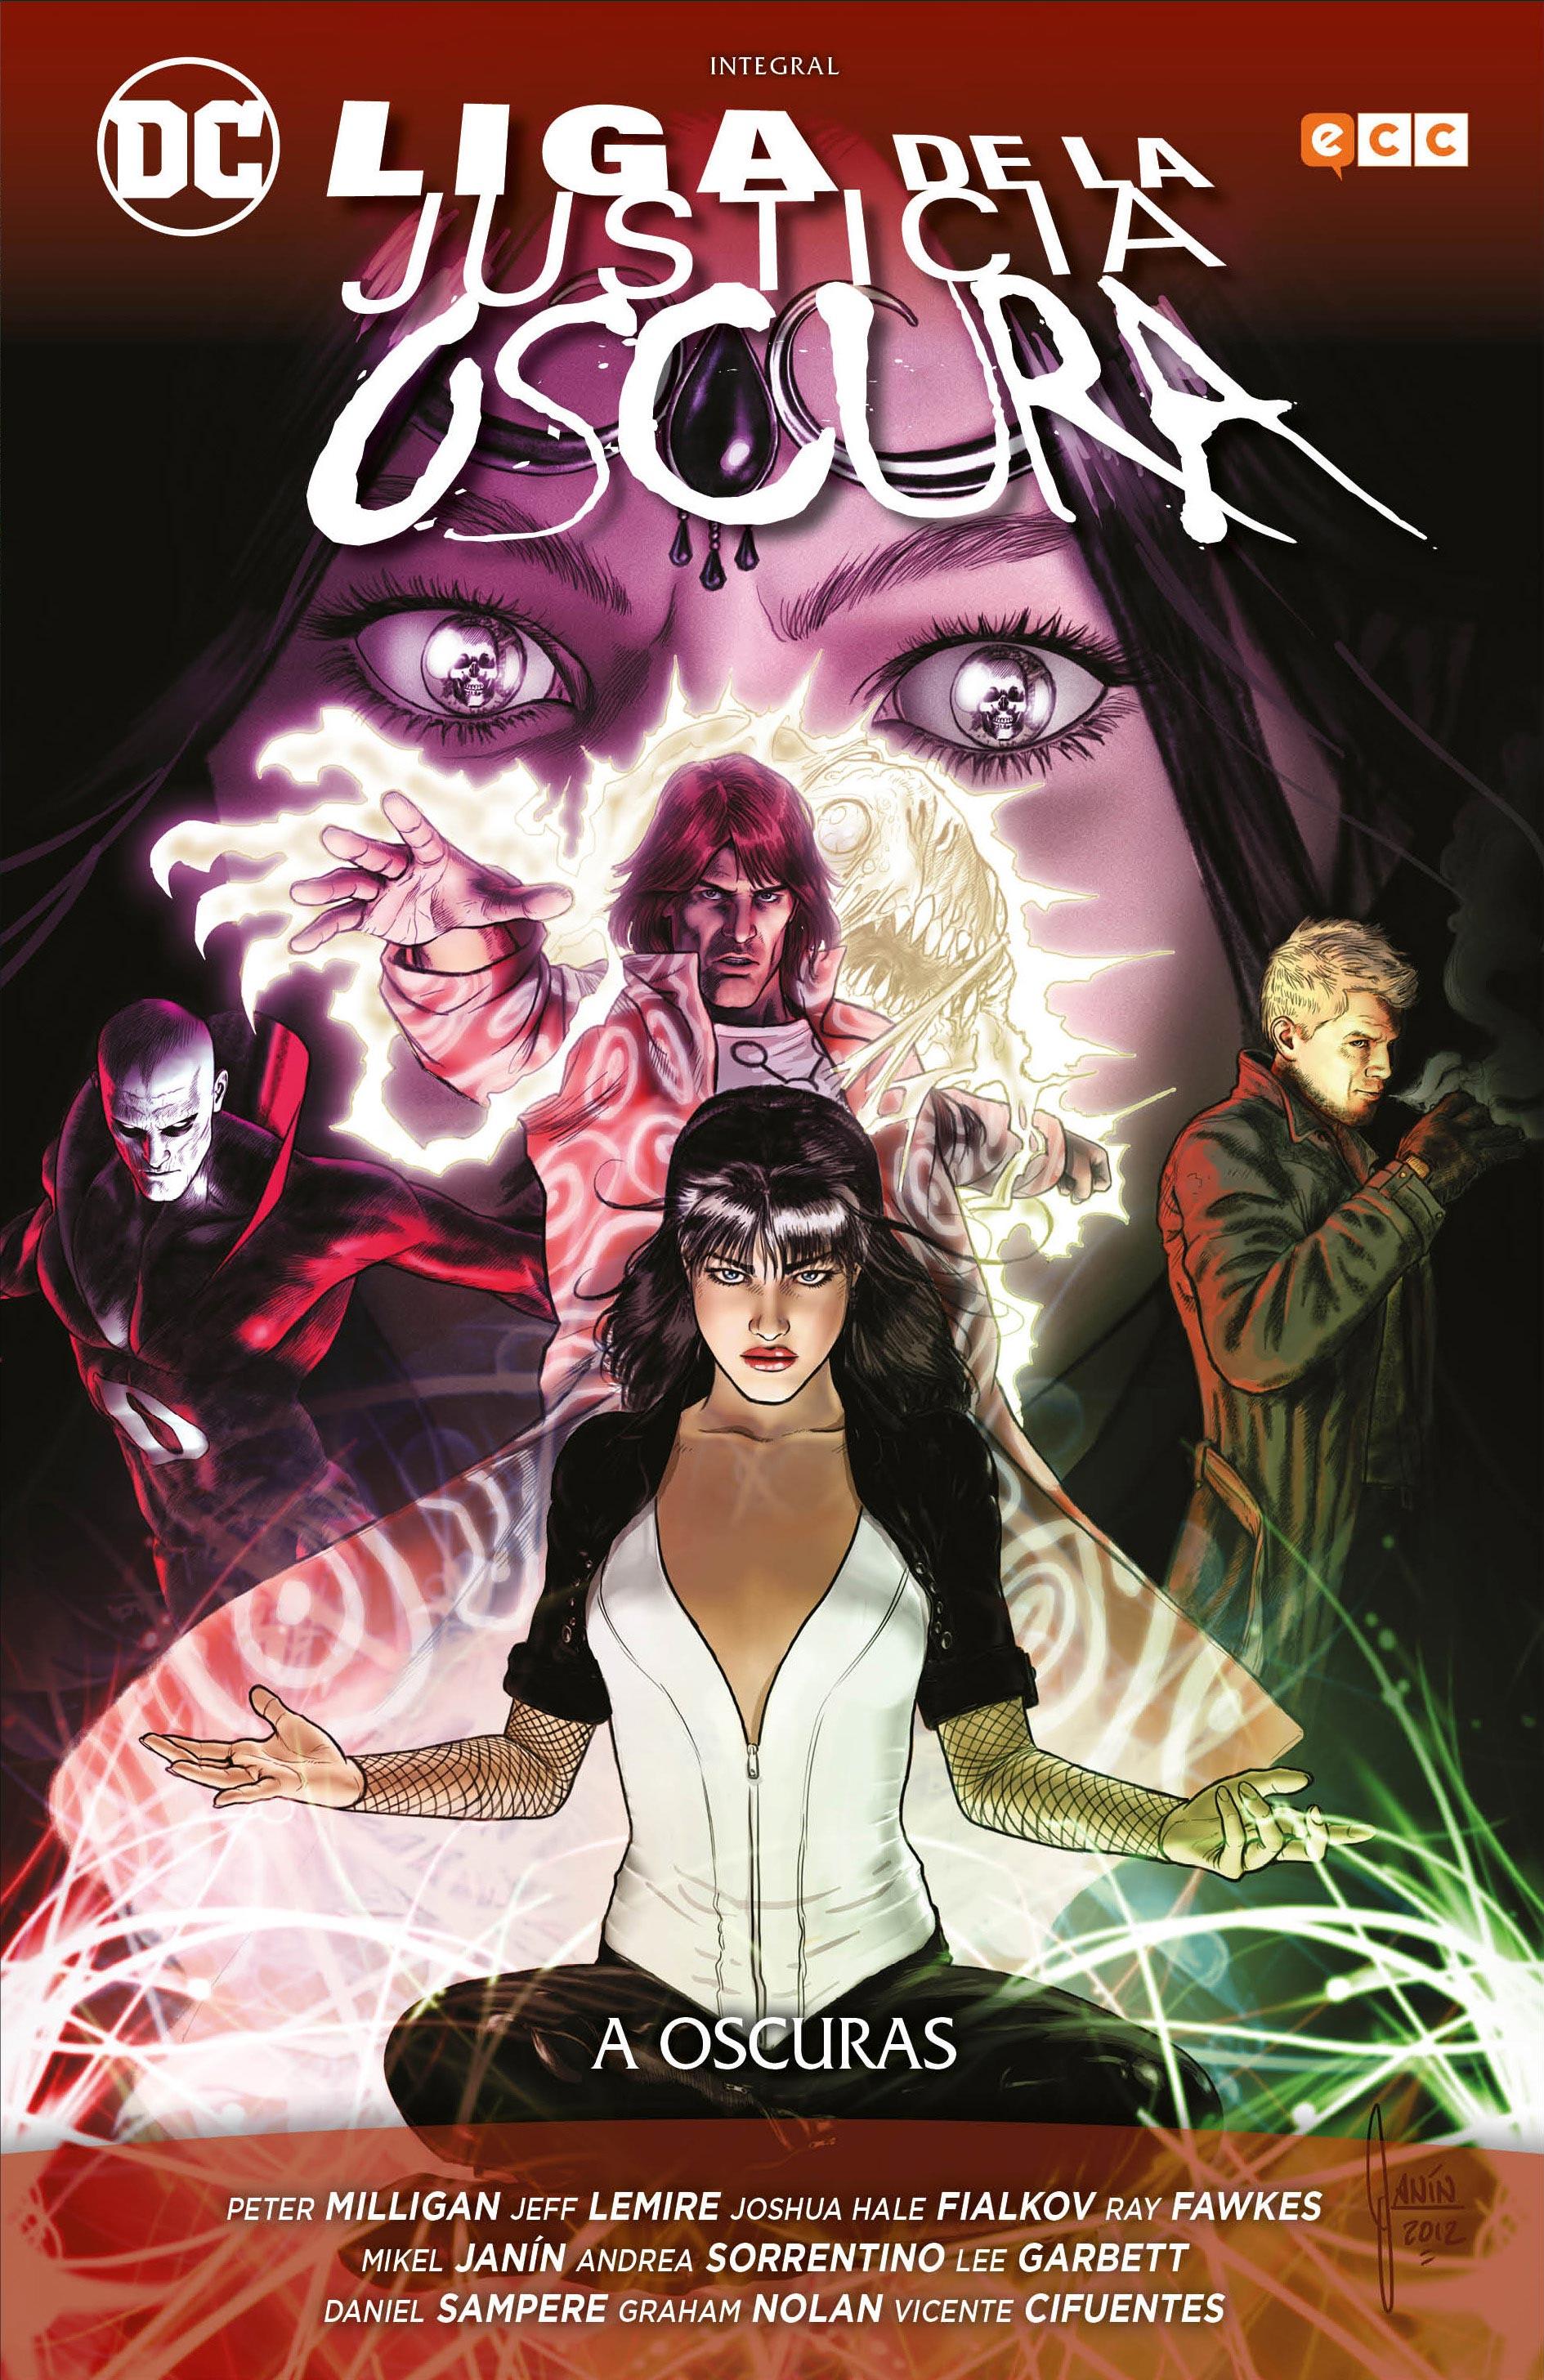 Liga de la Justicia Oscura: A oscuras - Integral